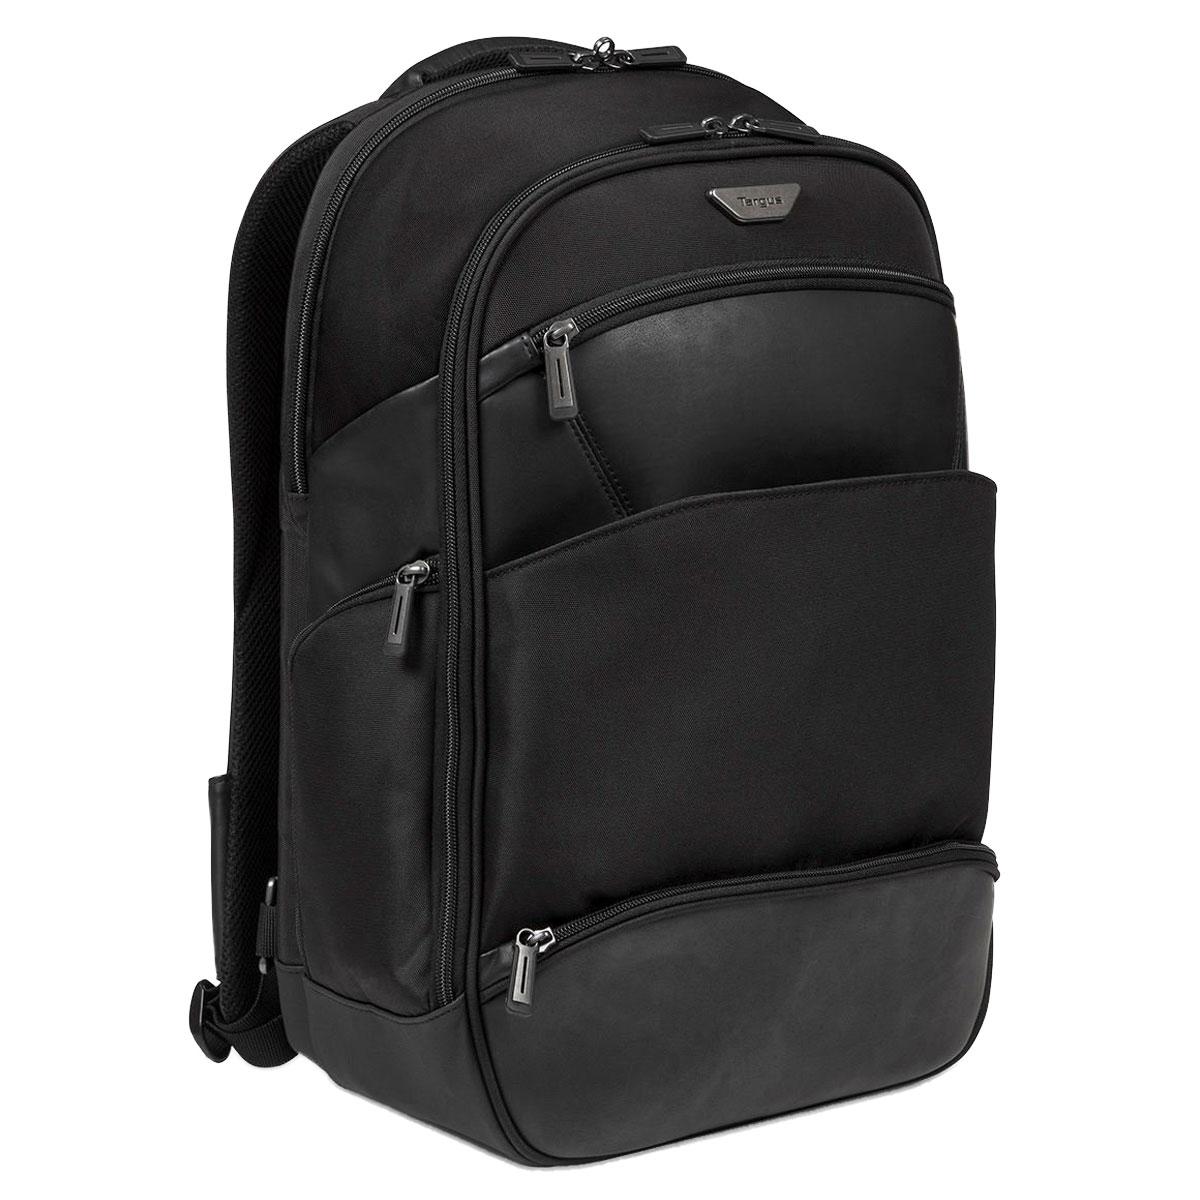 targus mobile vip backpack 12 15 6 sac sacoche housse targus sur. Black Bedroom Furniture Sets. Home Design Ideas